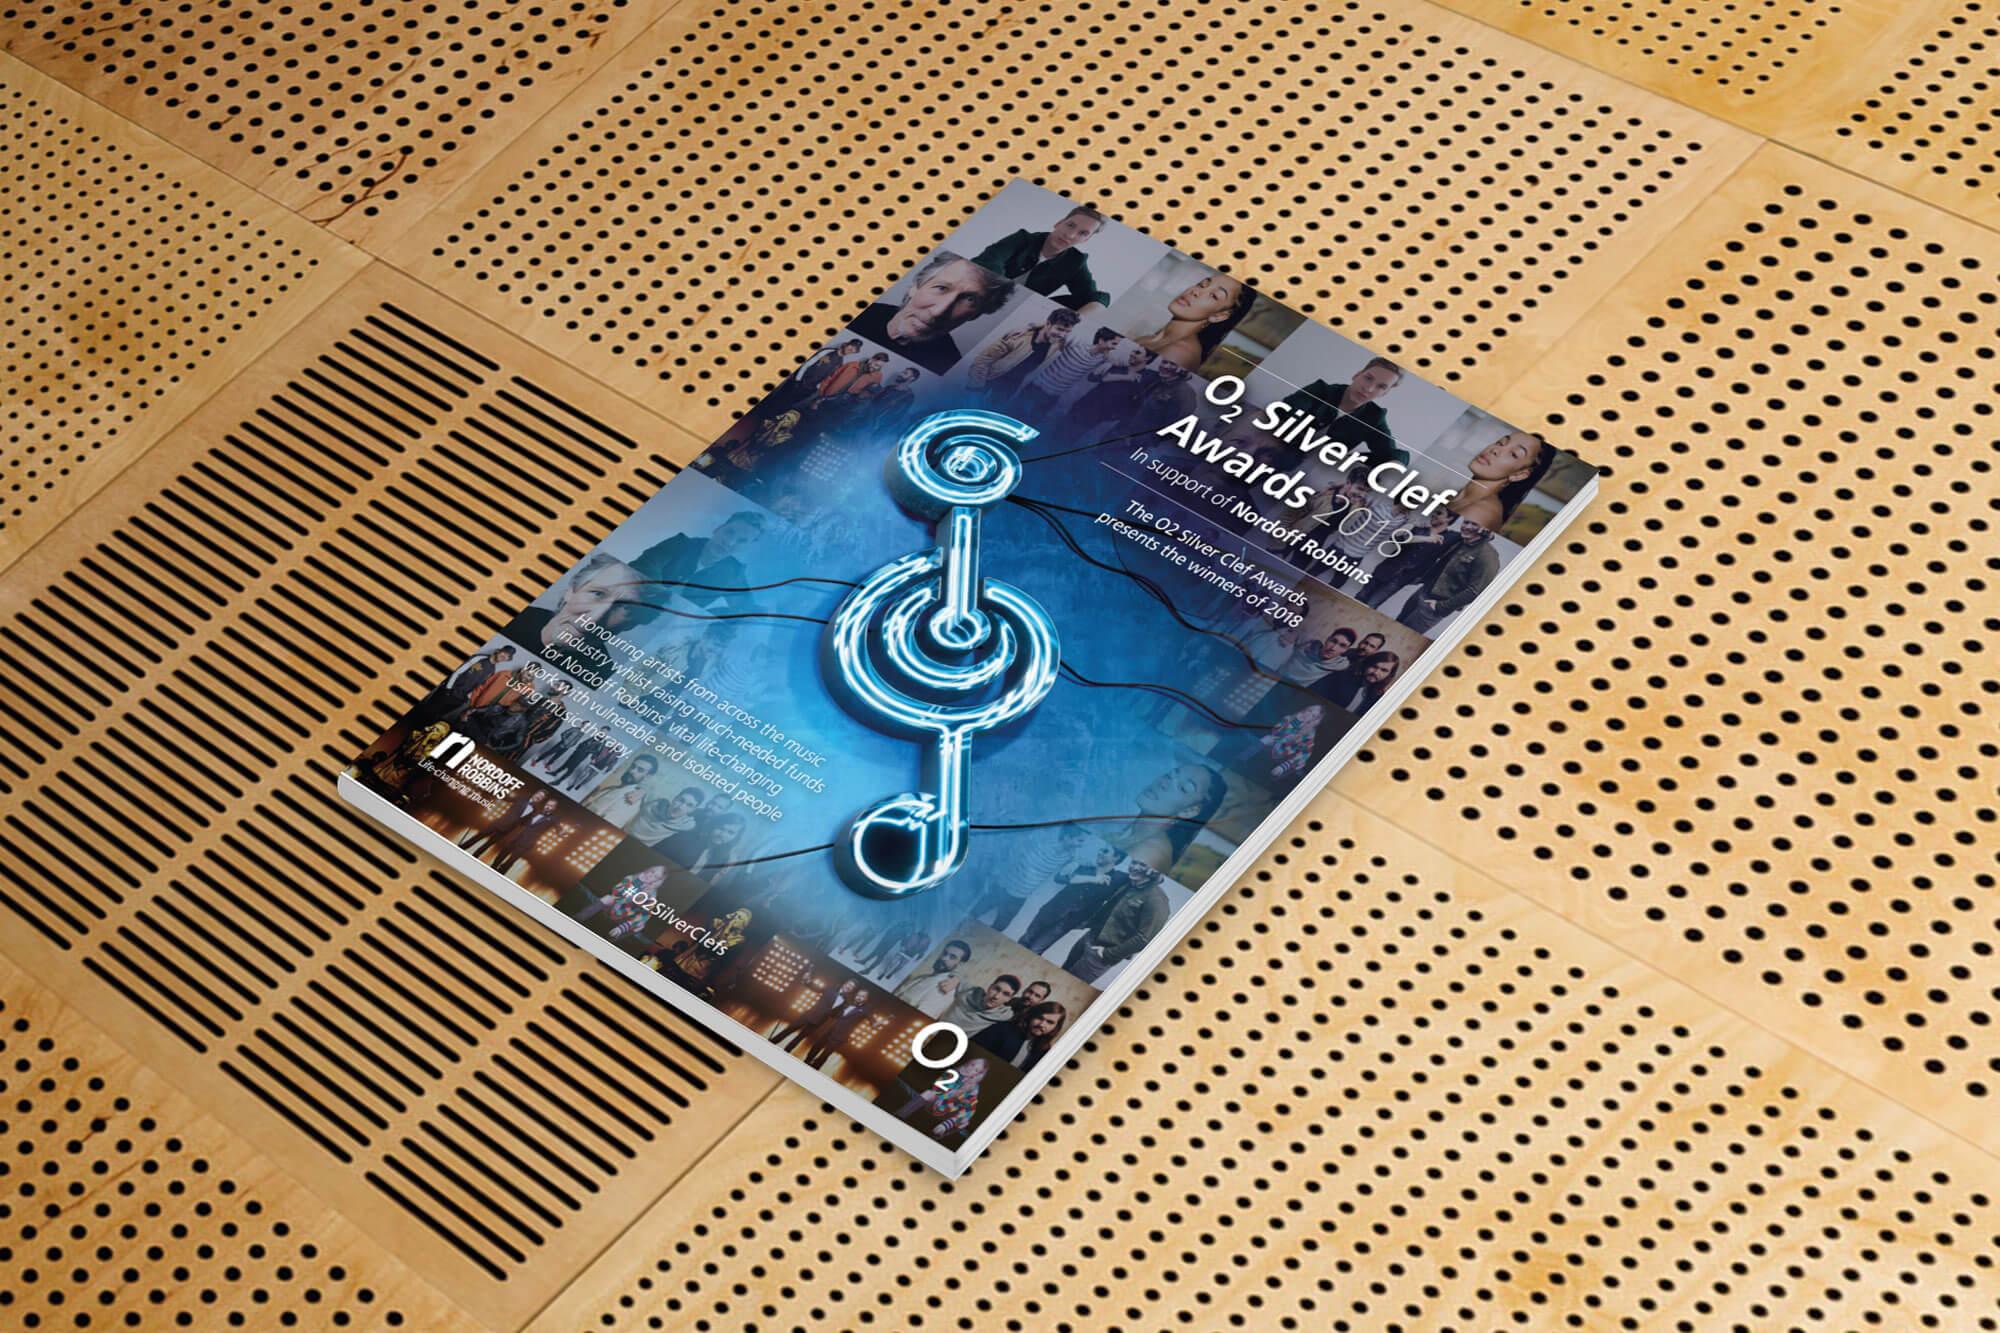 gpj-studio-o2-silver-clef-awards-brand-refresh-cs-08